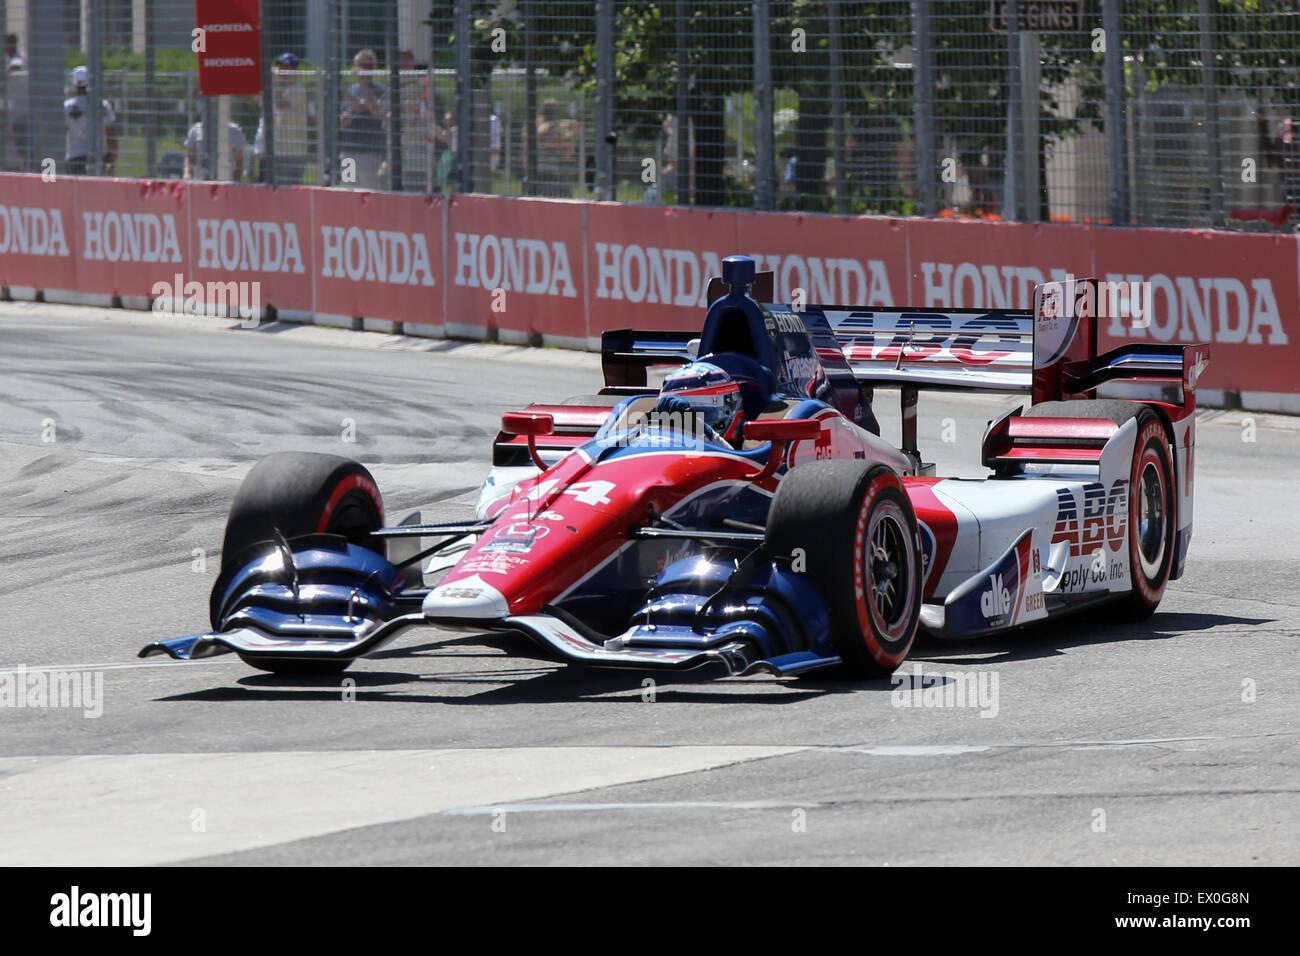 formula one car race honda indy toronto canada - Stock Image